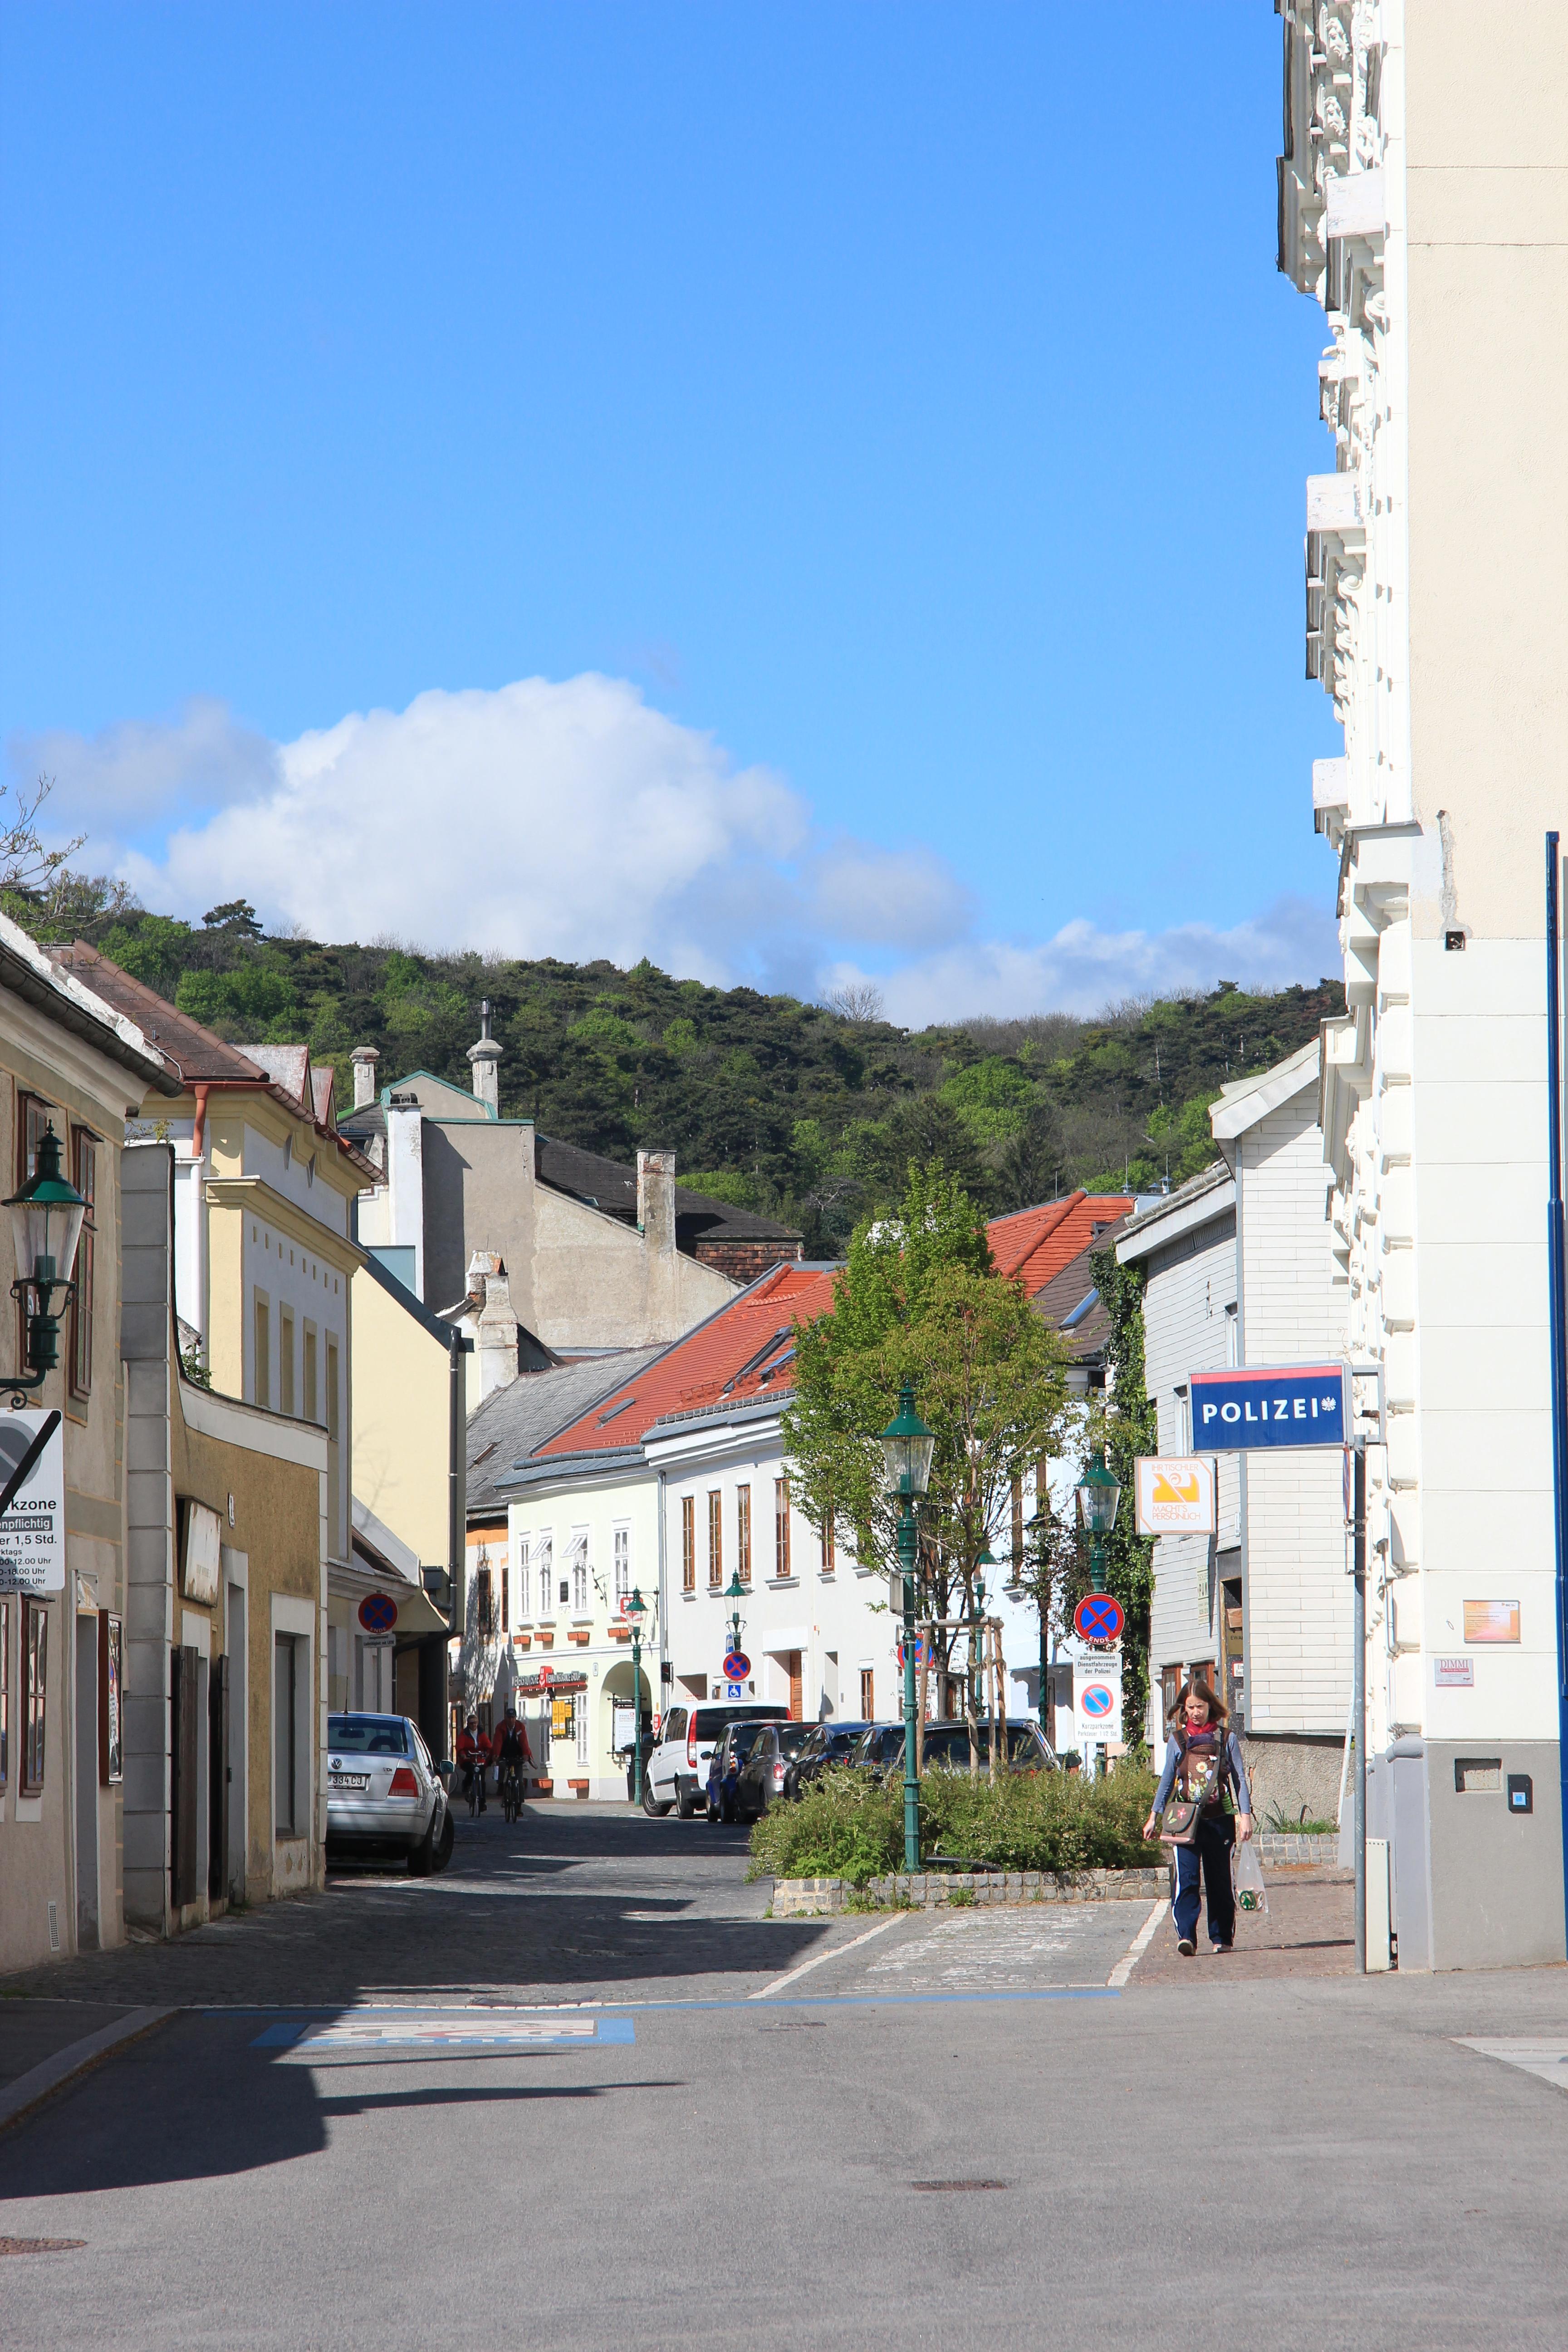 Filemödling Hauptstraße 8008jpg Wikimedia Commons